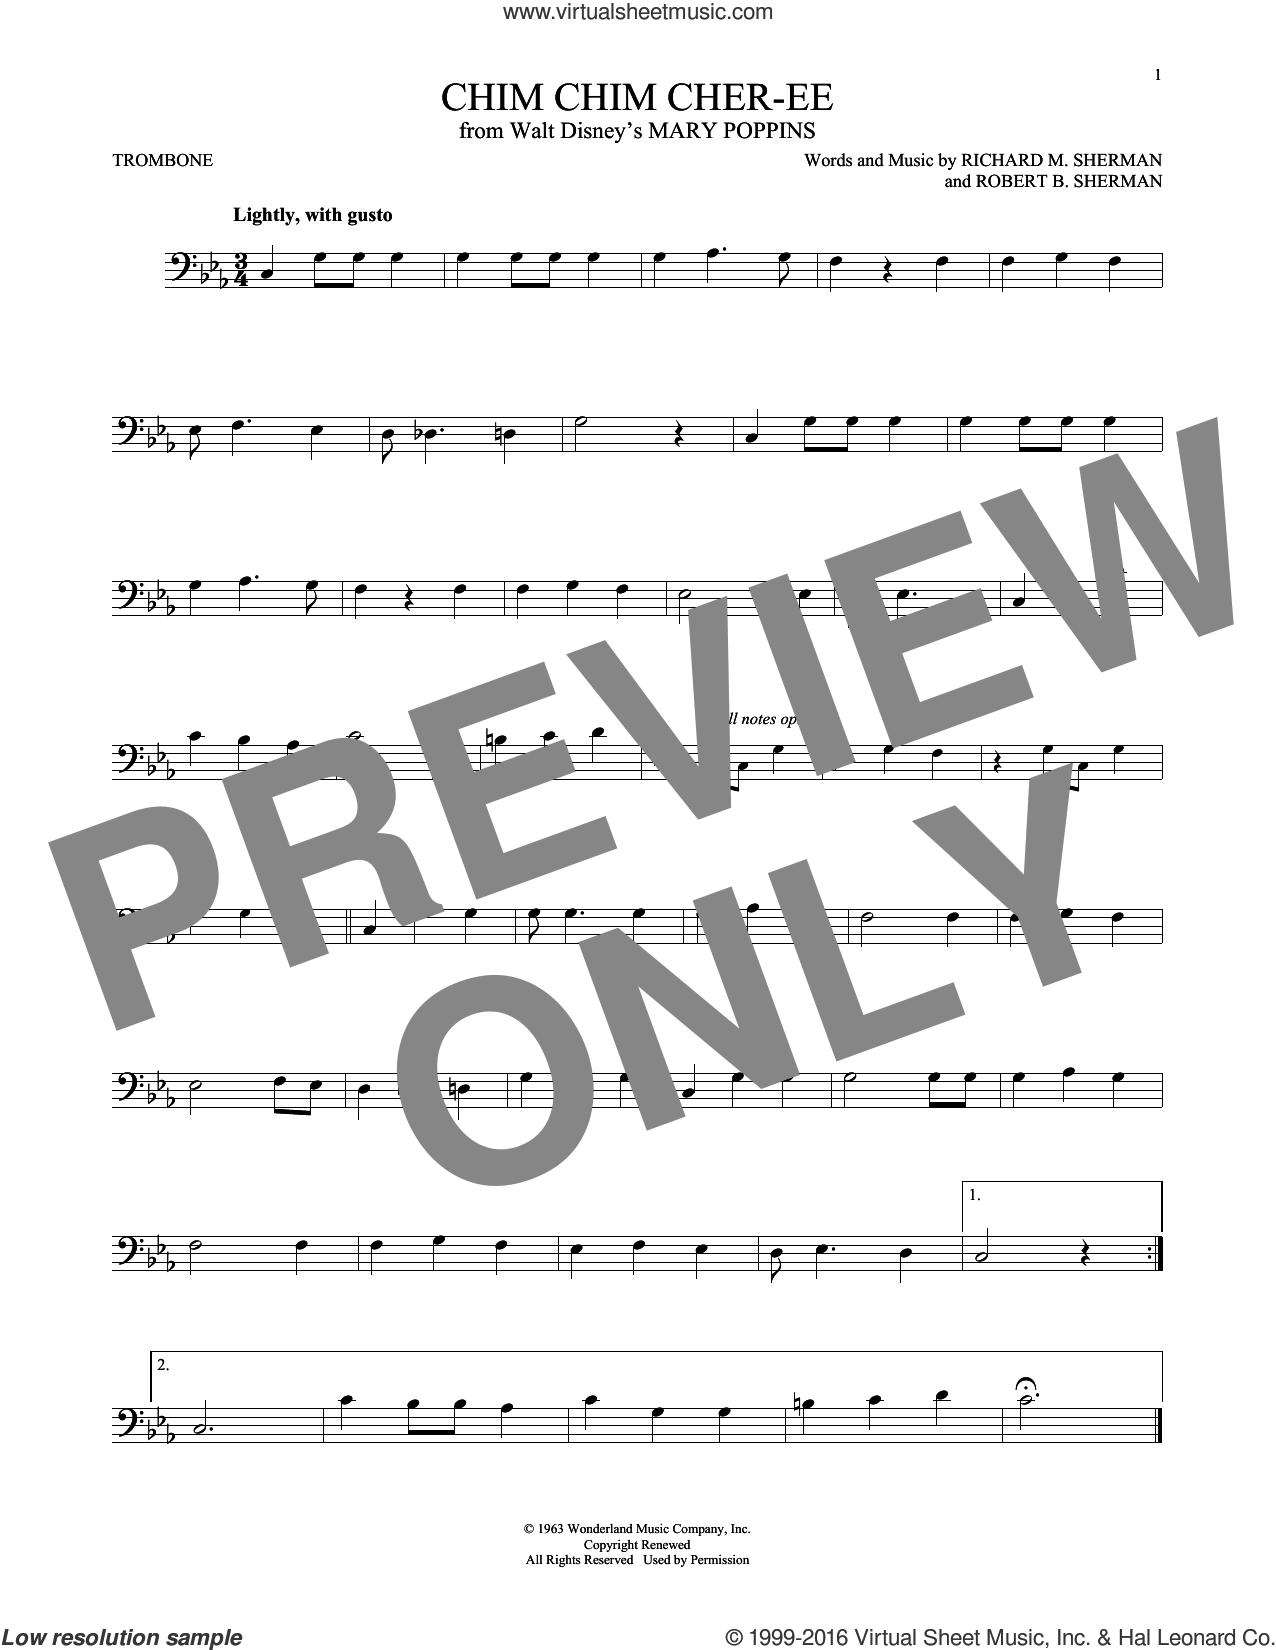 Chim Chim Cher-ee sheet music for trombone solo by Richard M. Sherman, New Christy Minstrels and Robert B. Sherman, intermediate skill level